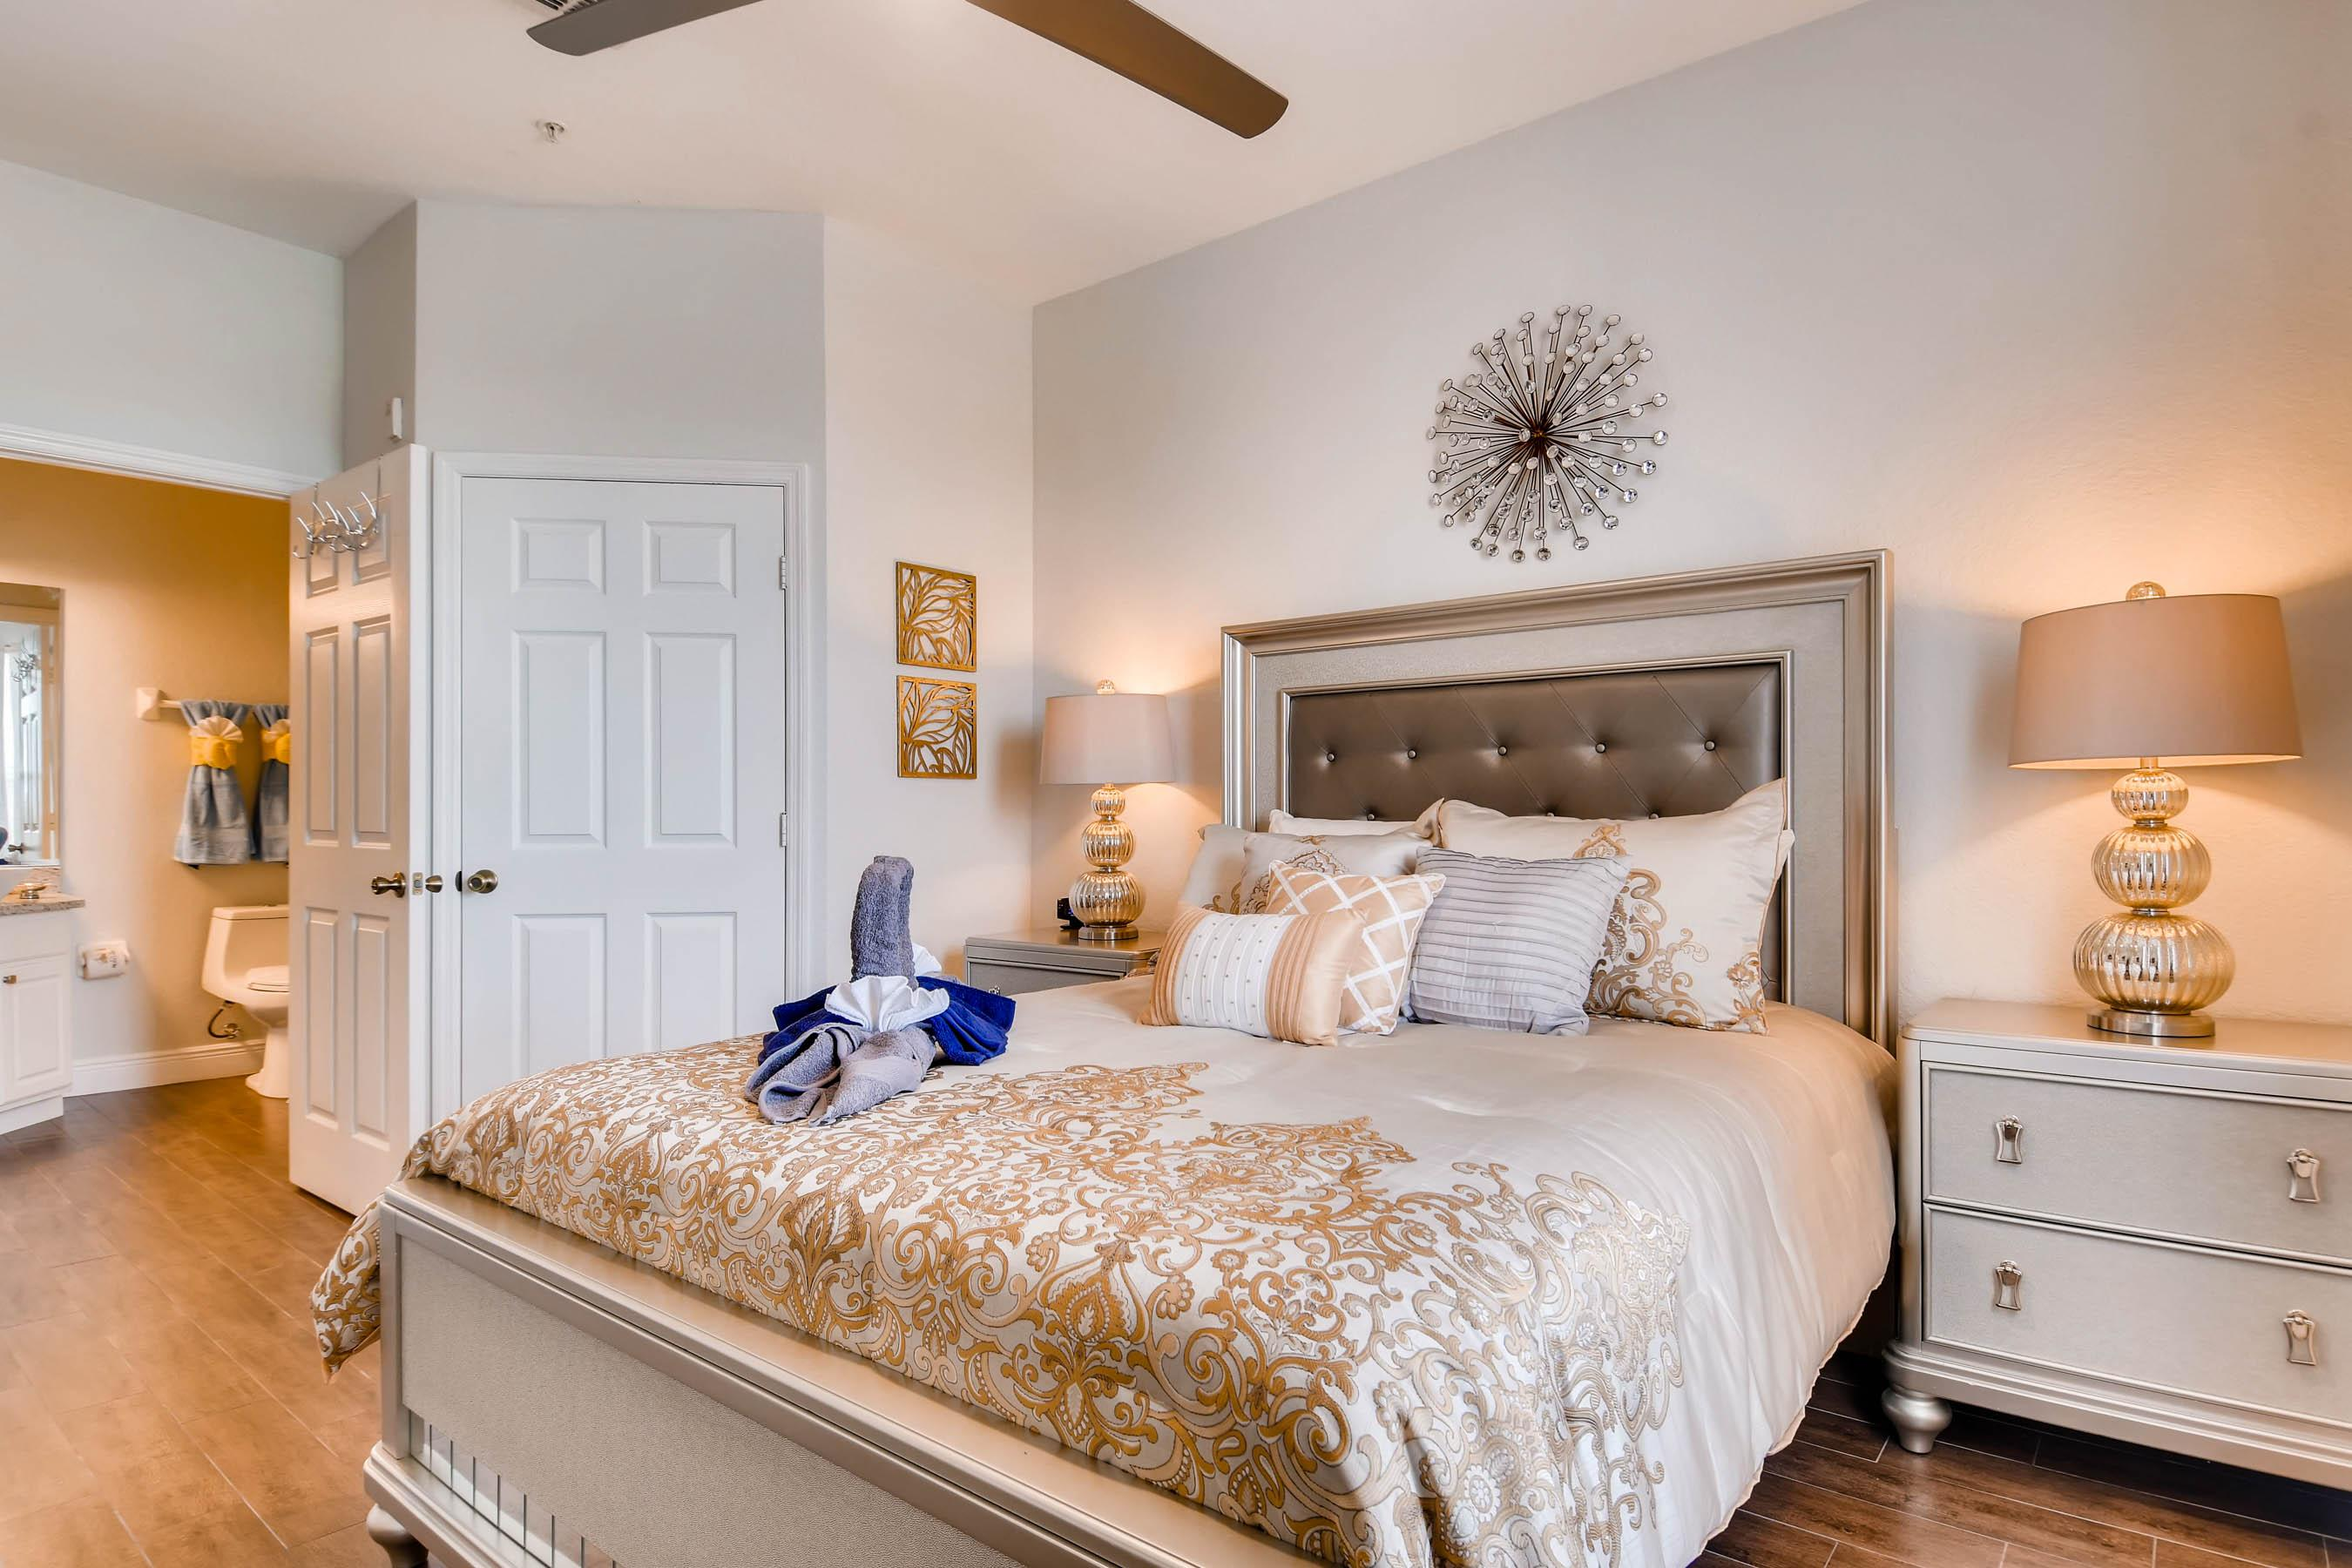 Another view of the master bedroom, ALso seen: walk in closet & en-suite master bath